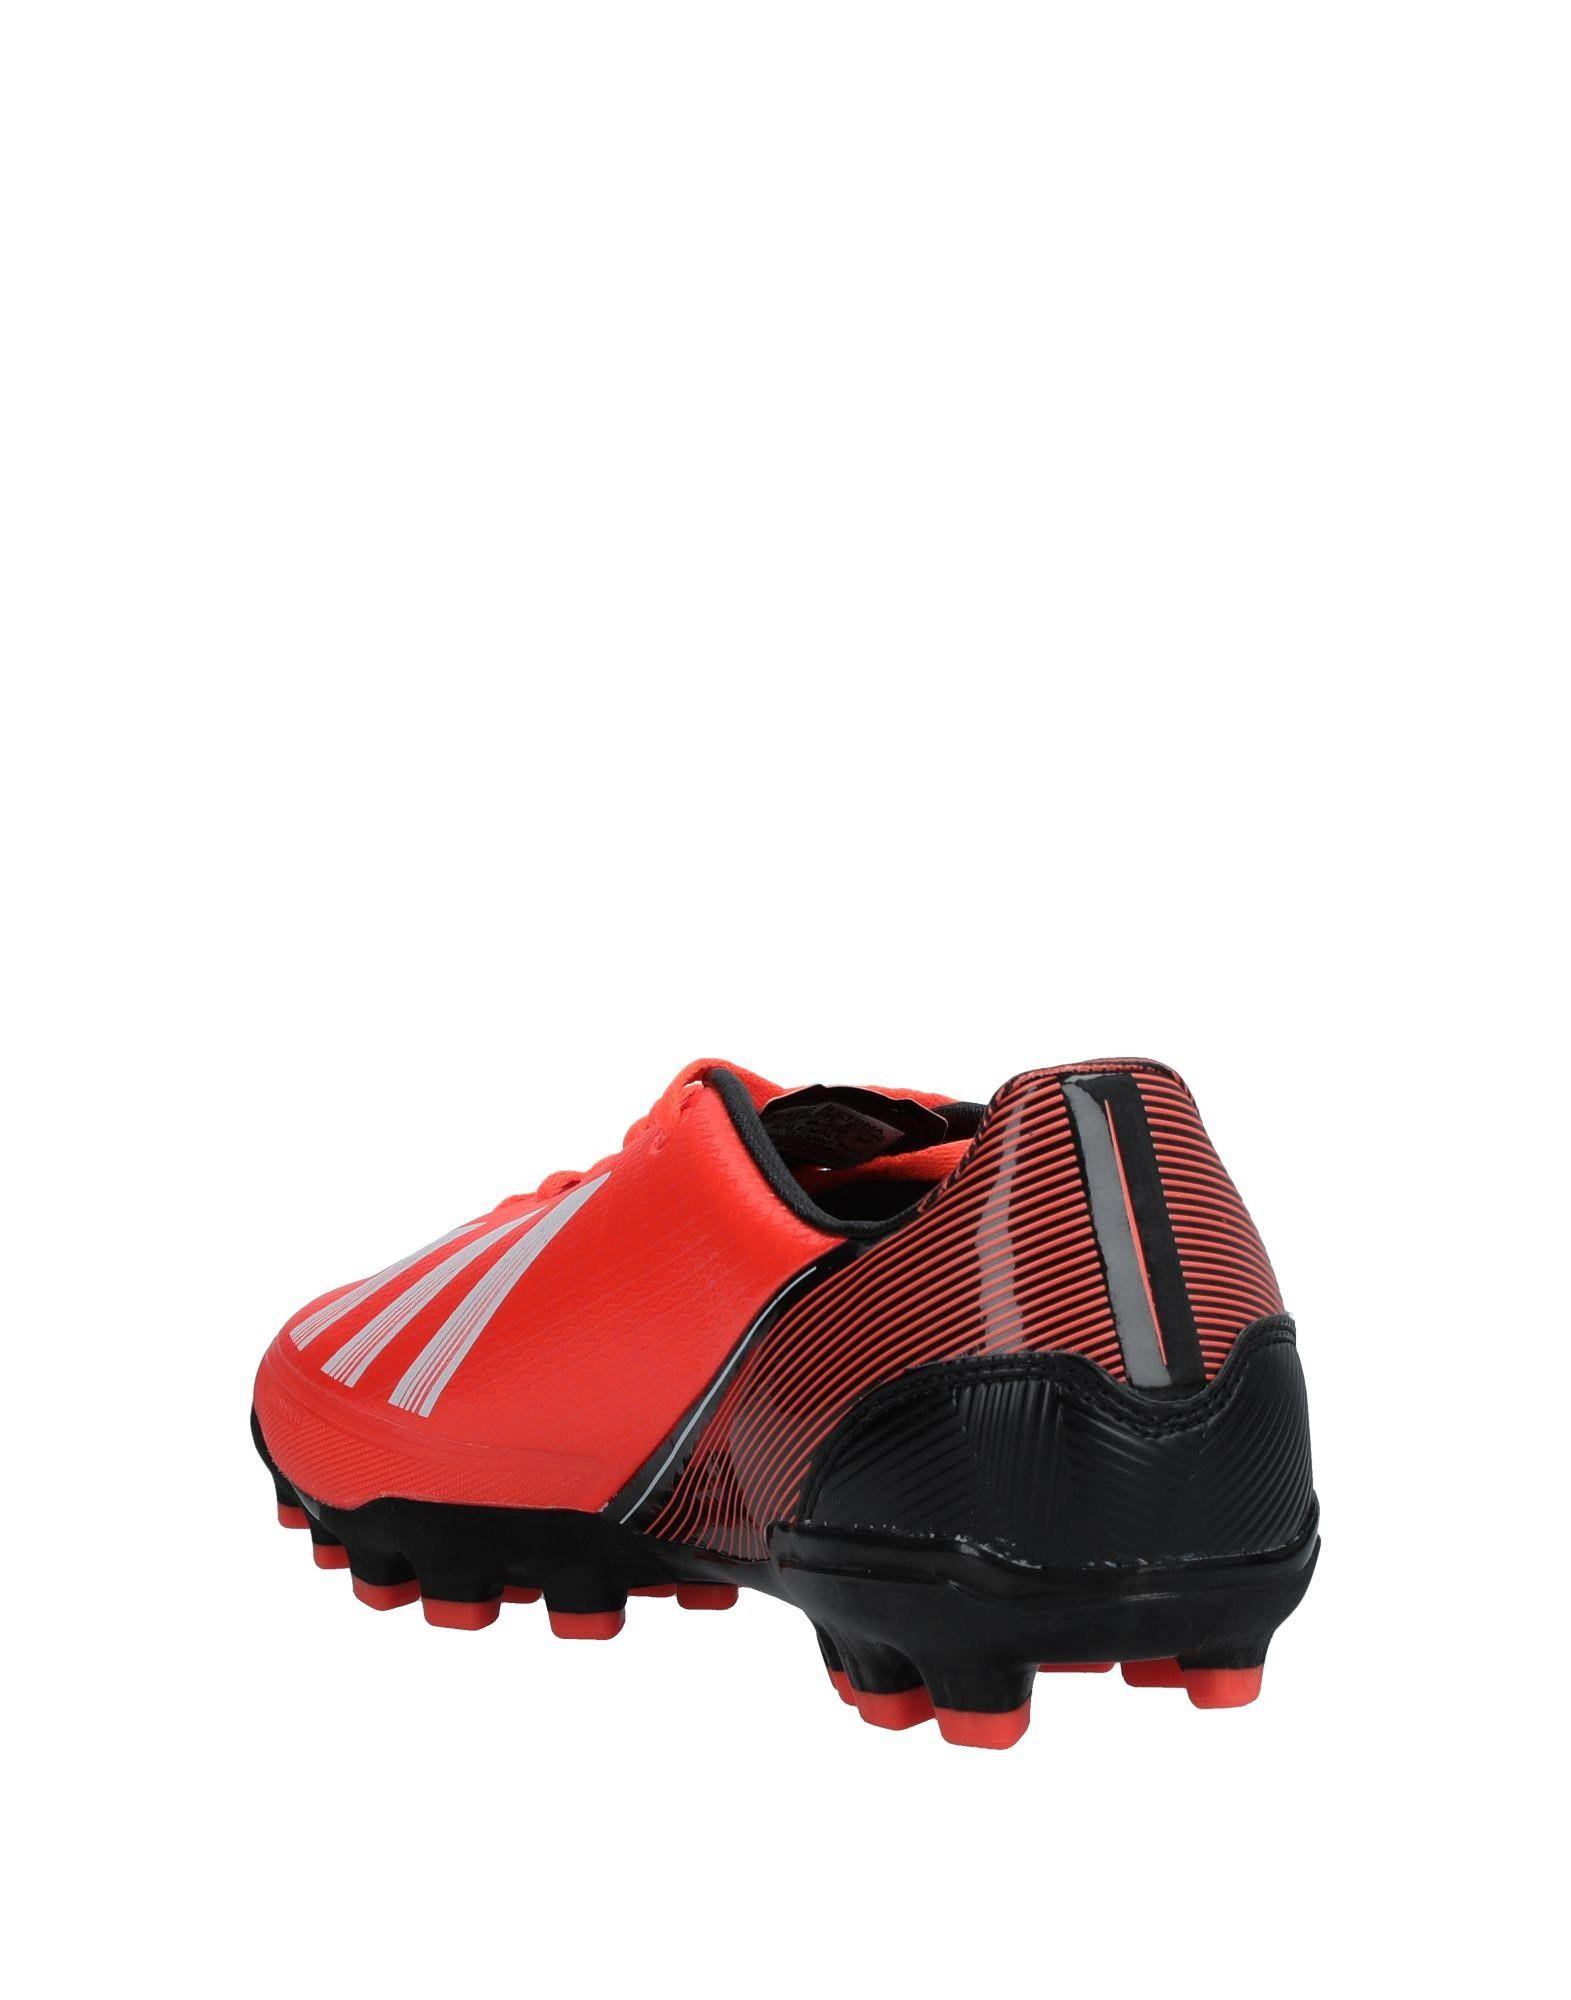 Adidas Heiße Sneakers Herren  11527716VQ Heiße Adidas Schuhe b66a6b